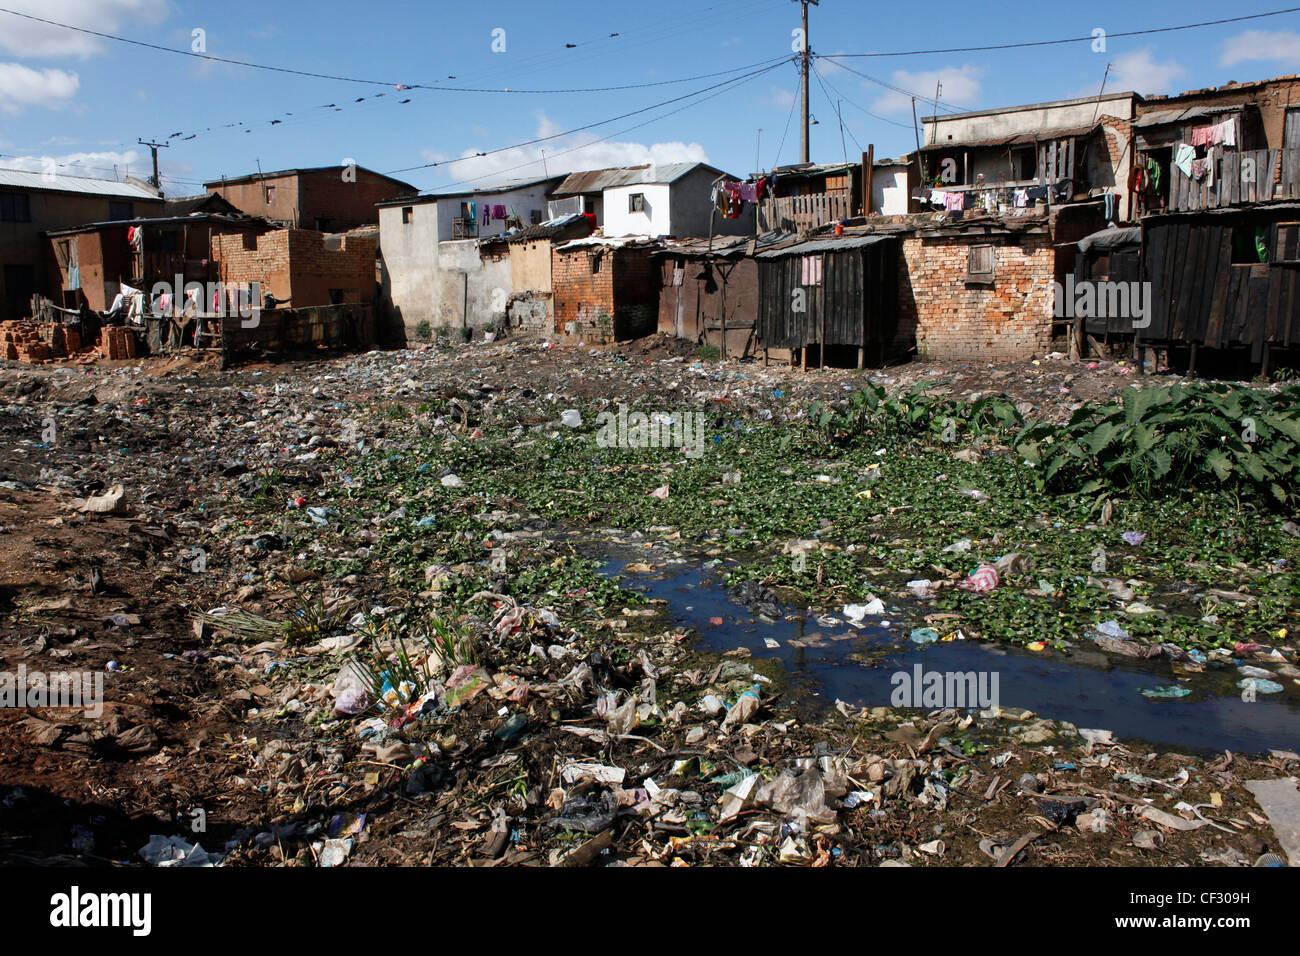 A residential neighbourhood in Madagascar's capital Antananarivo. - Stock Image